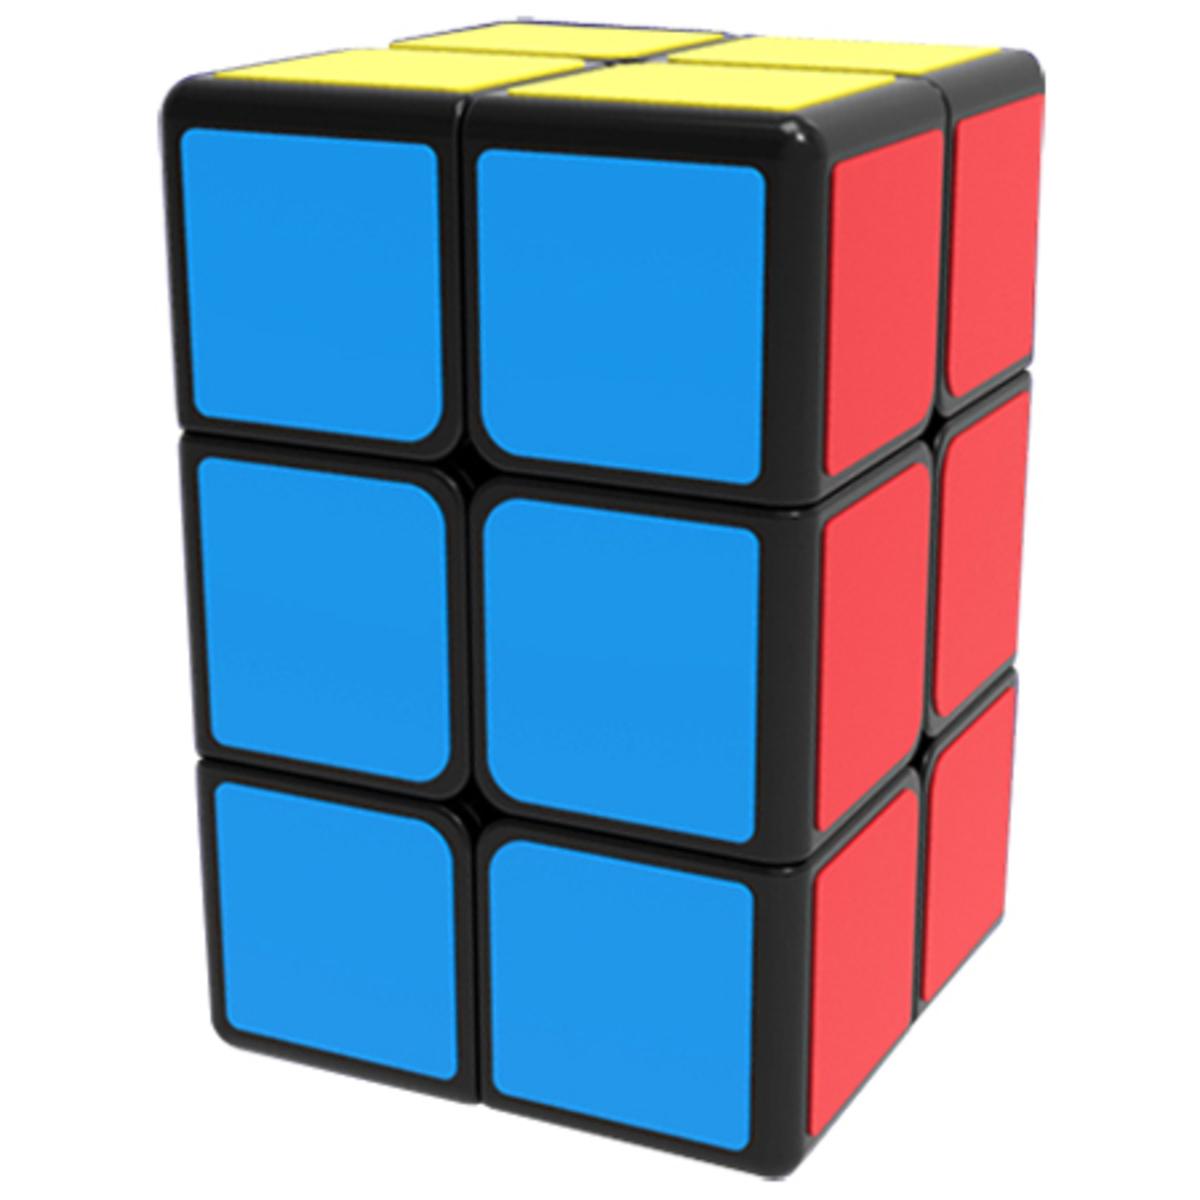 2x2x3 Qiyi